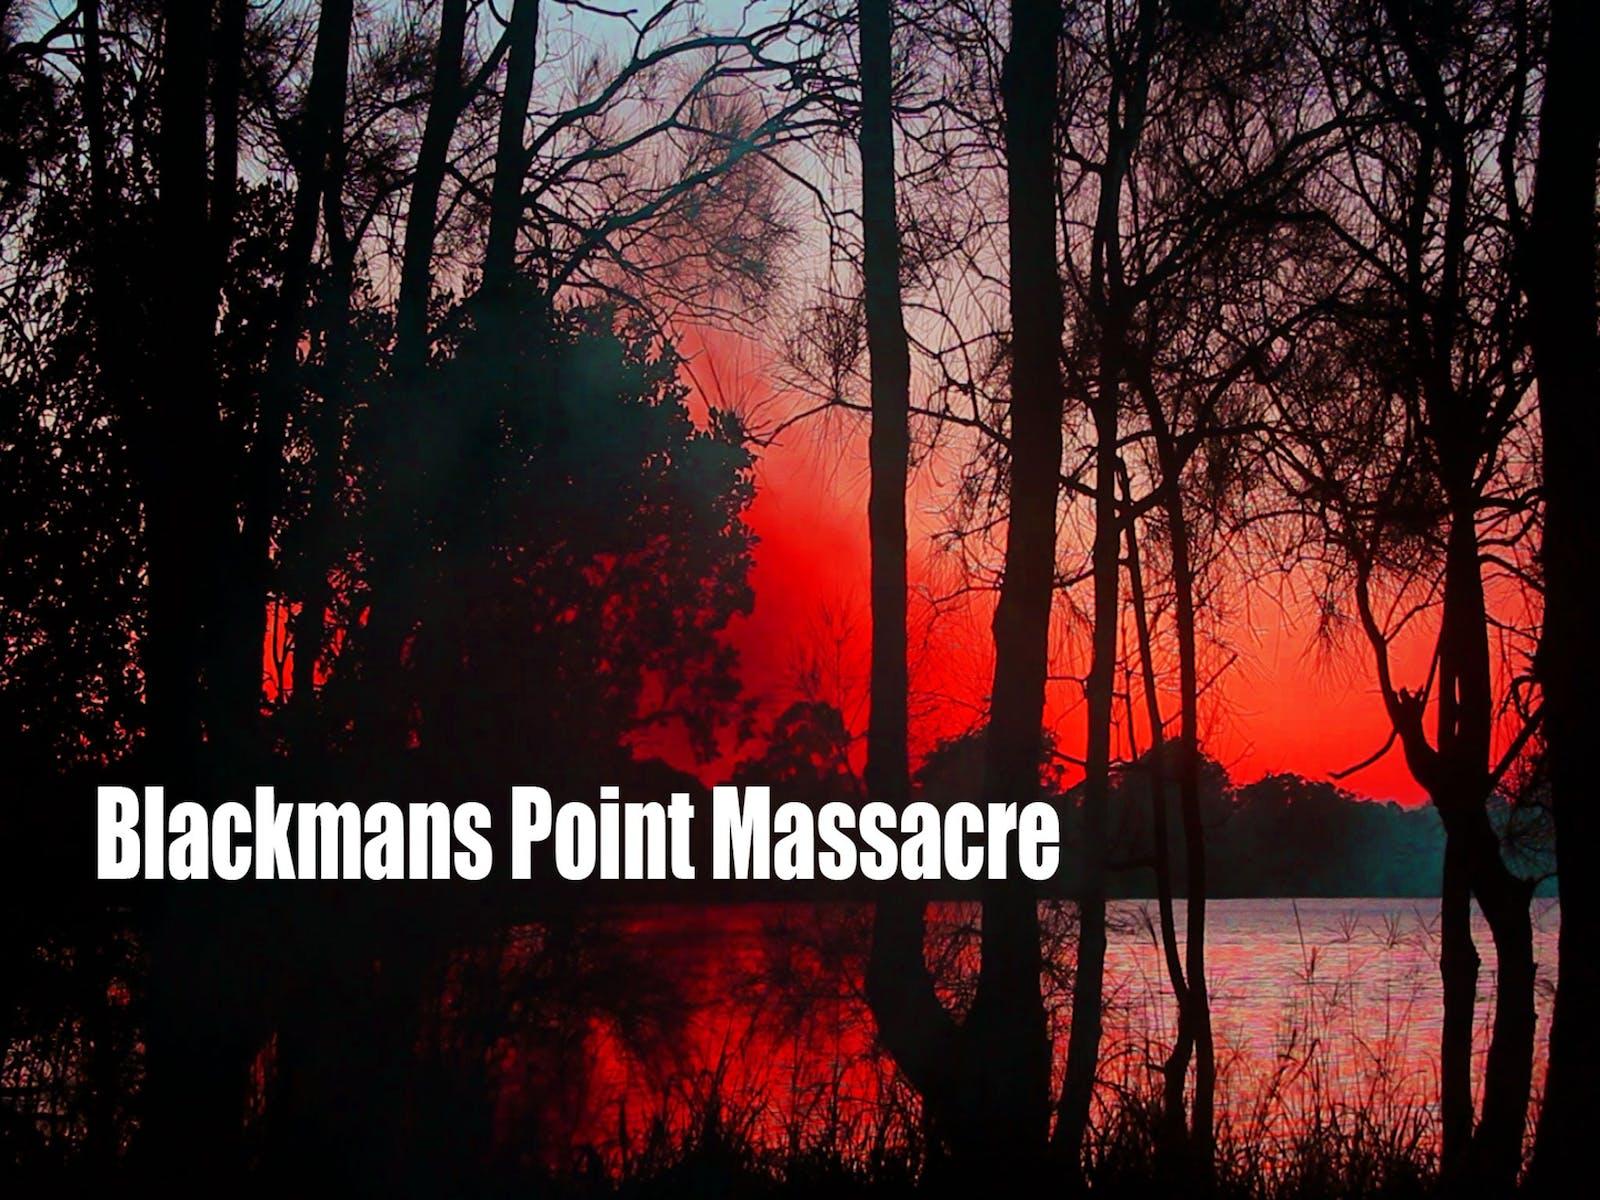 Image for 'Blackmans Point Massacre' Short Film Premiere by Big Mob Films and Panel Discussion